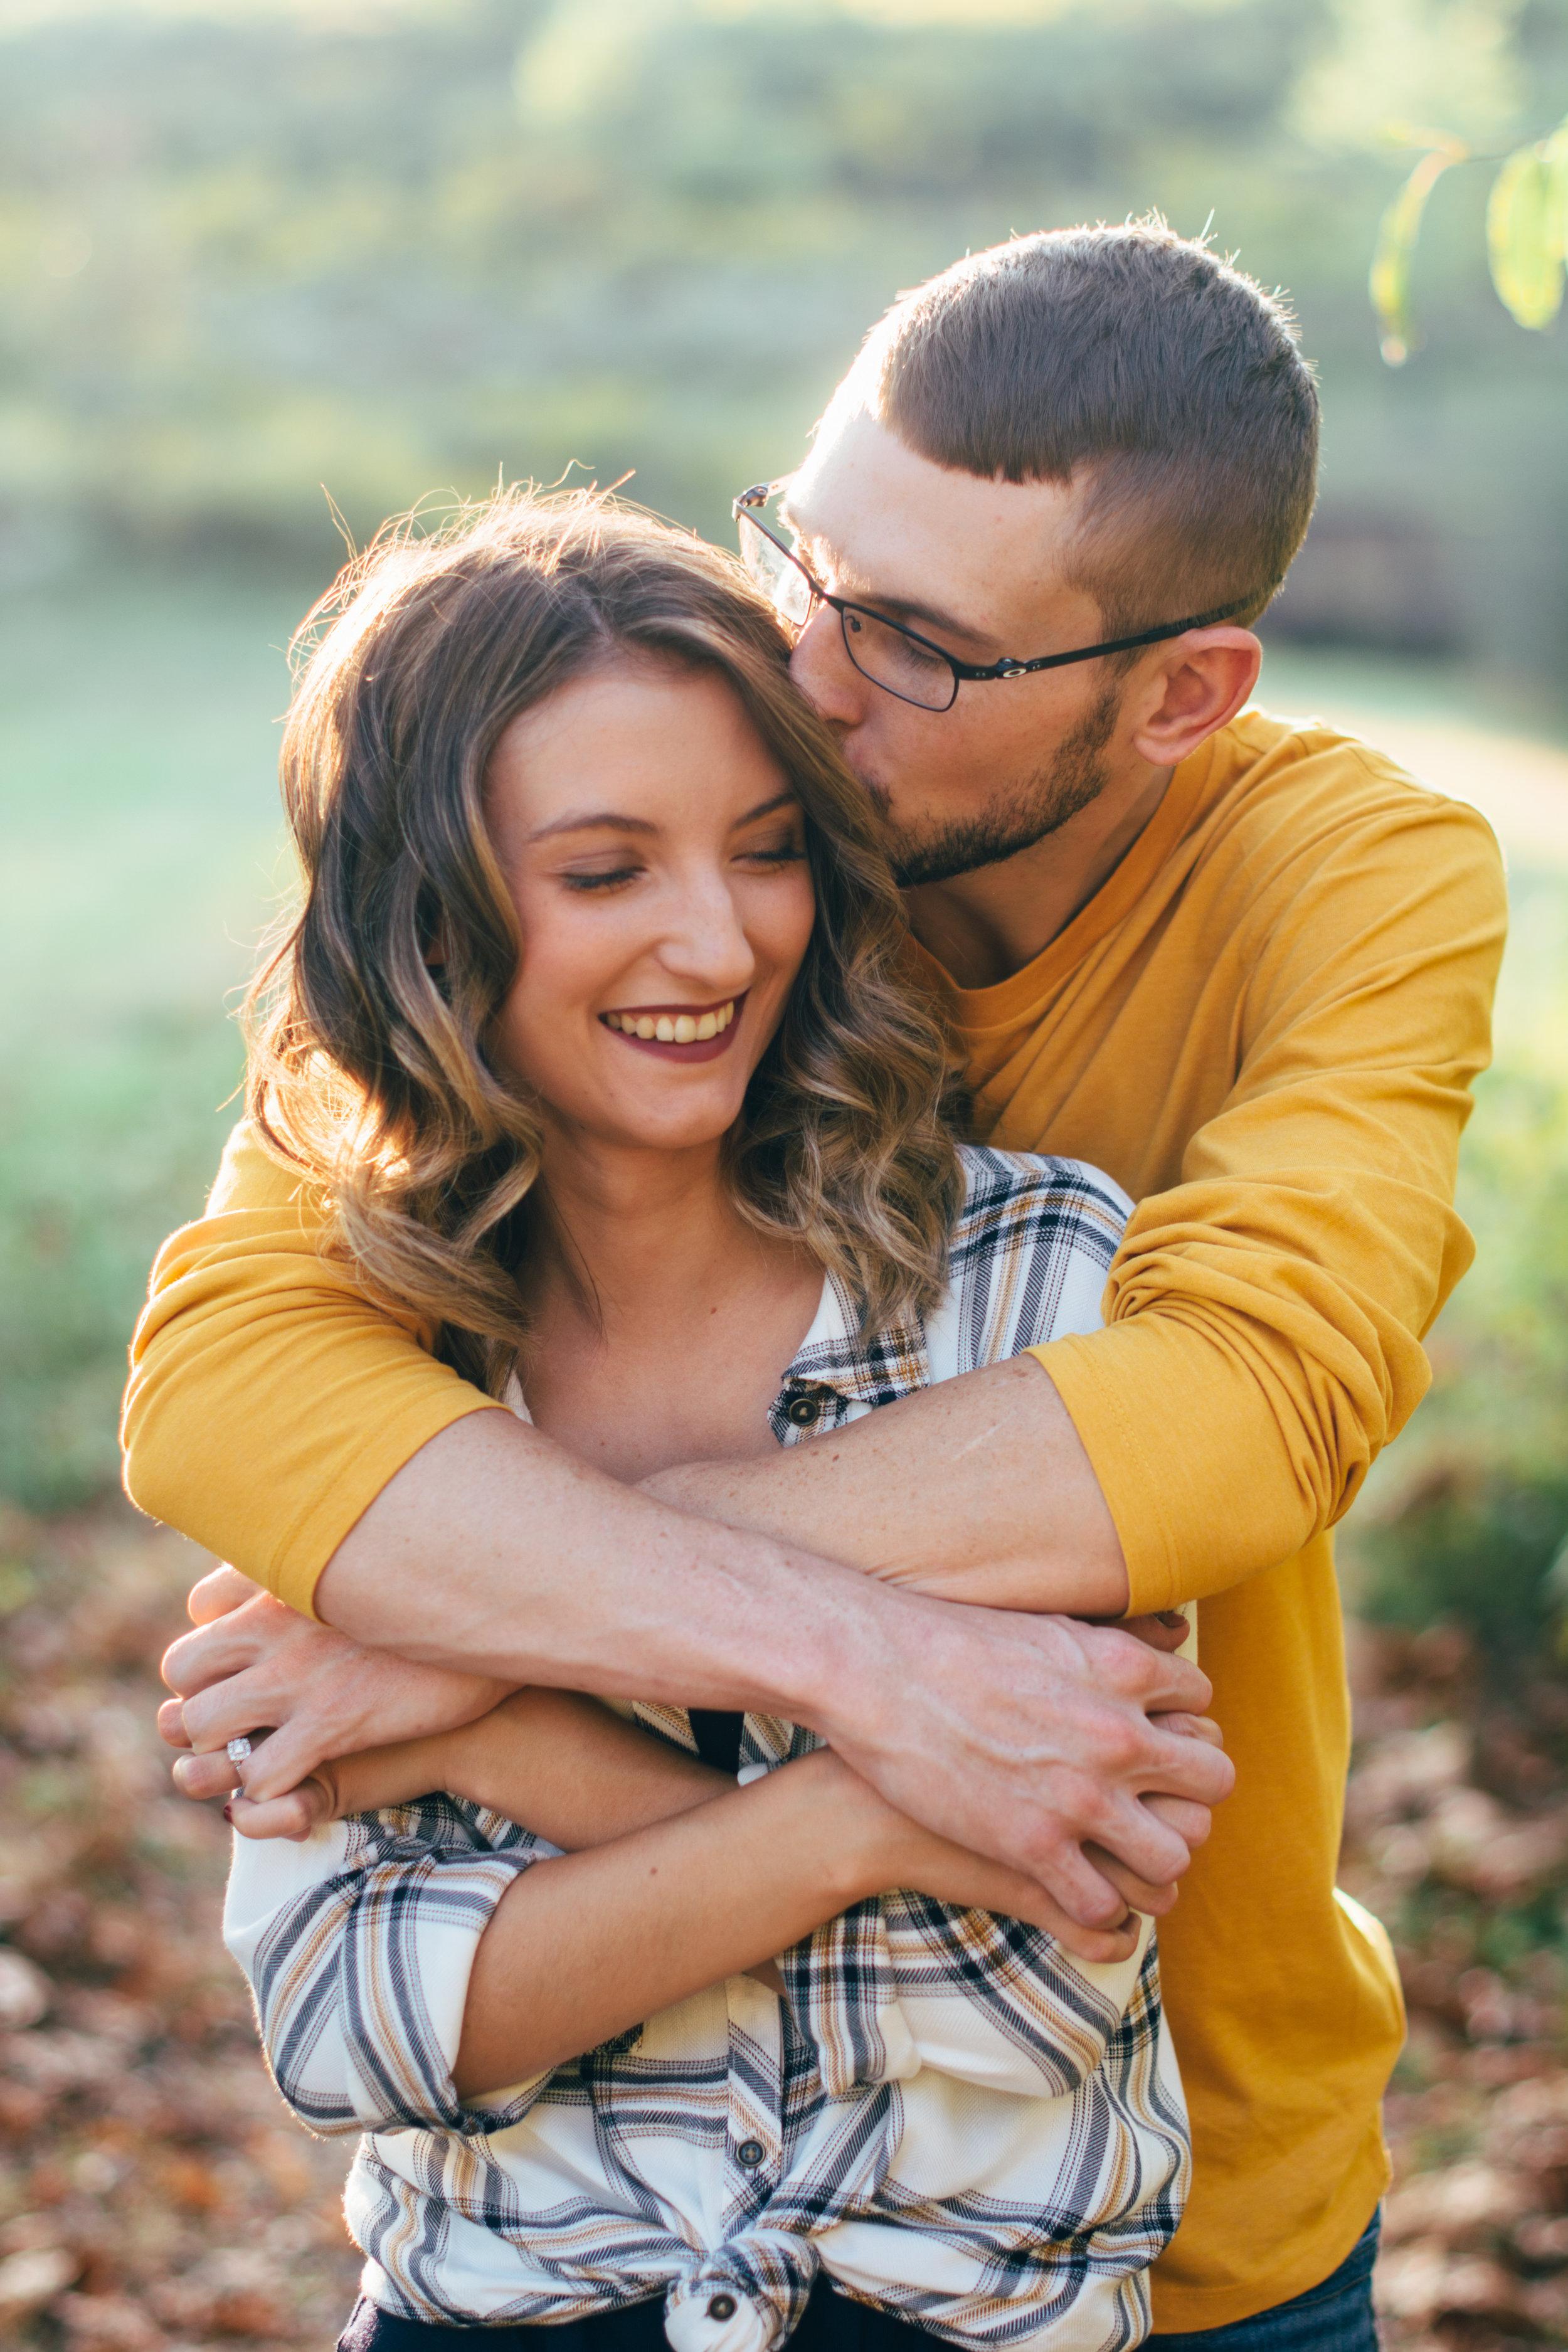 Tiffany-and-Chad-Engagement-26.jpg